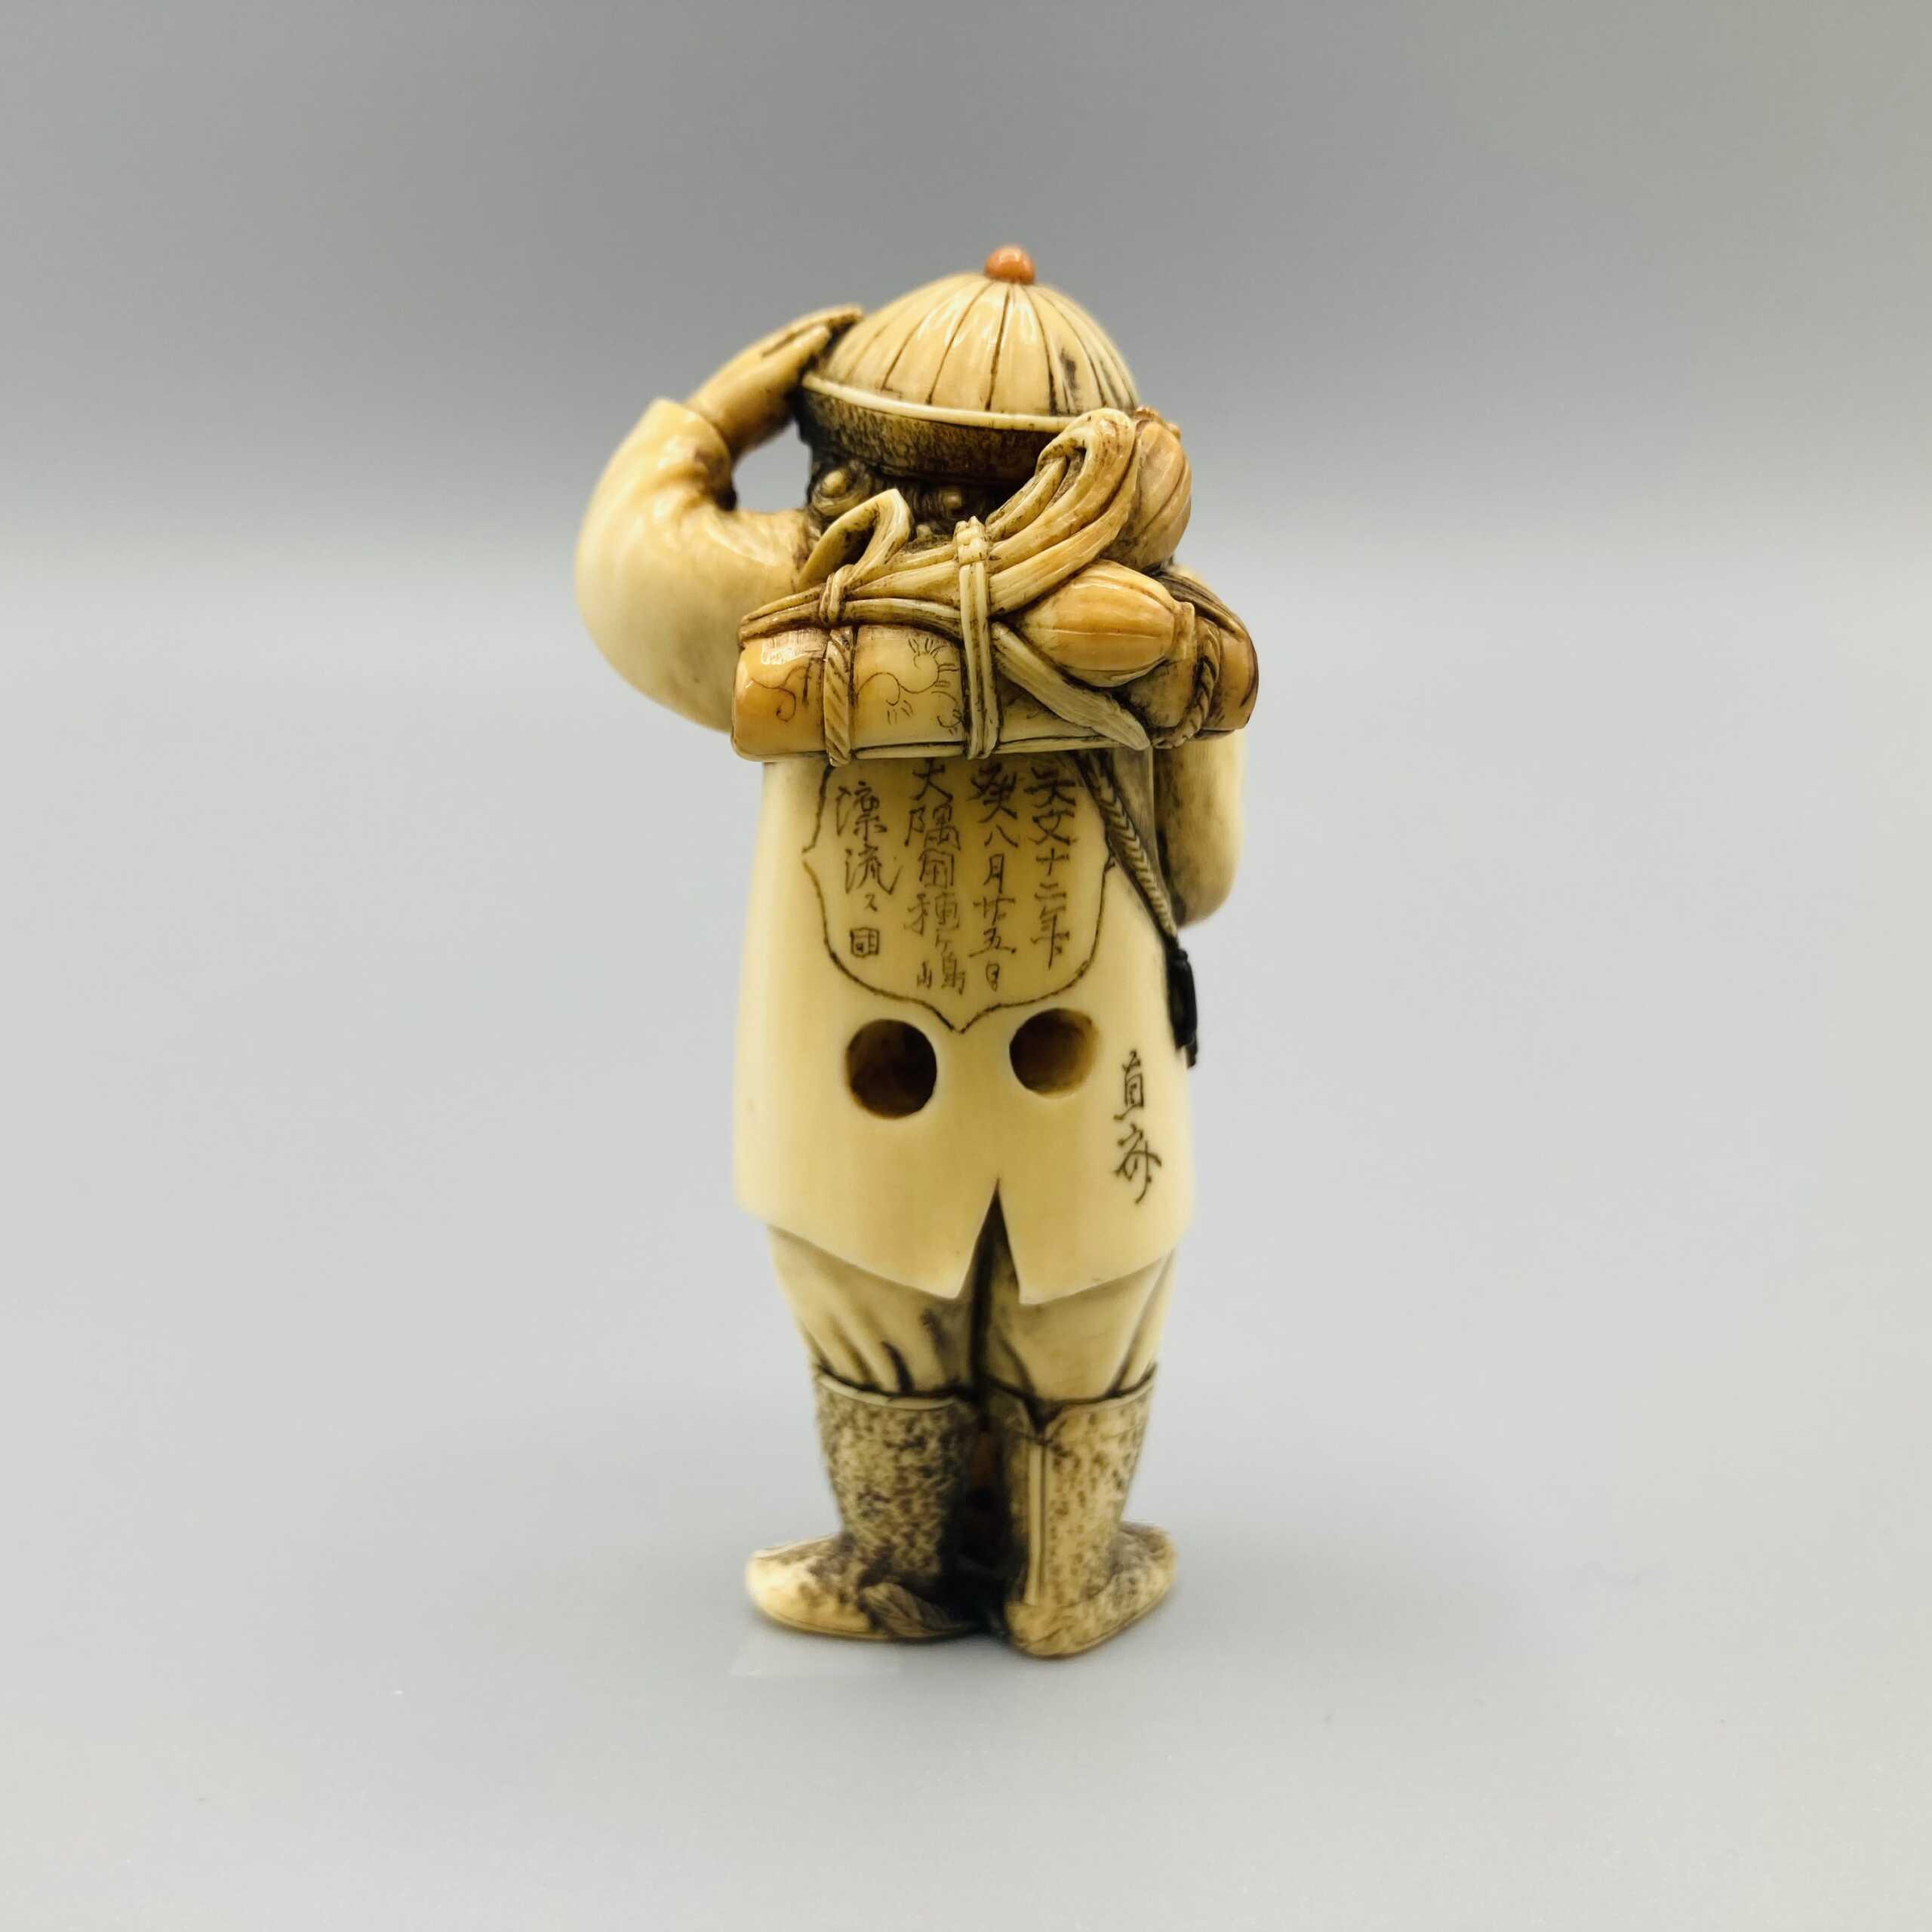 Chokusai ivory netsuke of FM Pinto 3